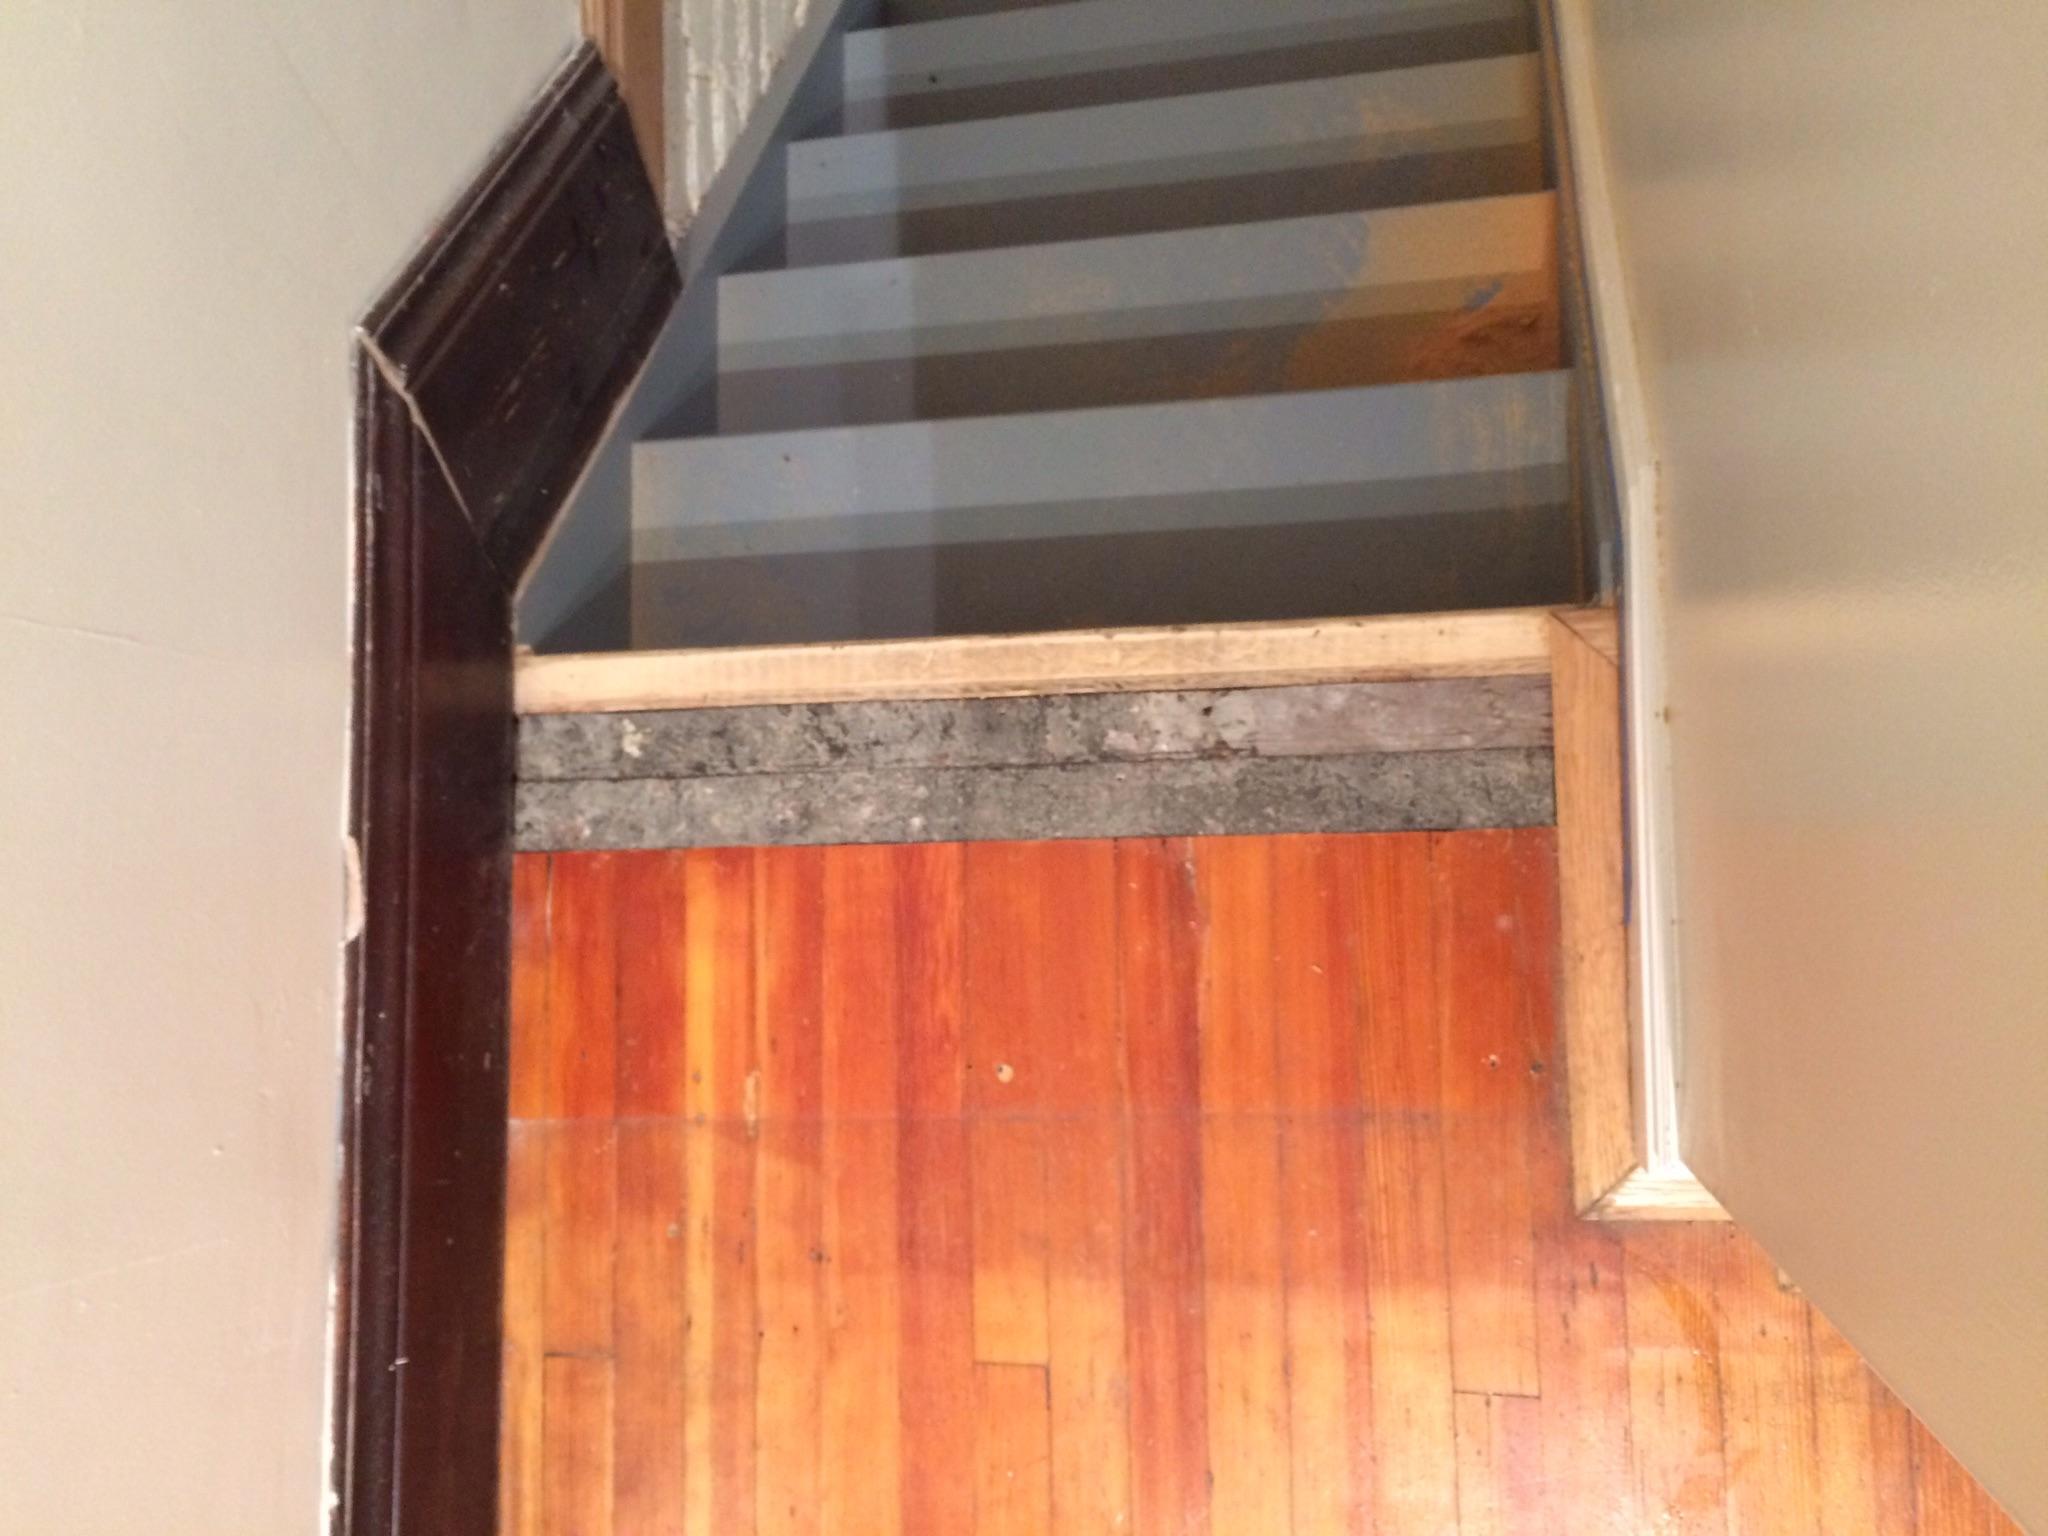 Stair Threshold: In progress